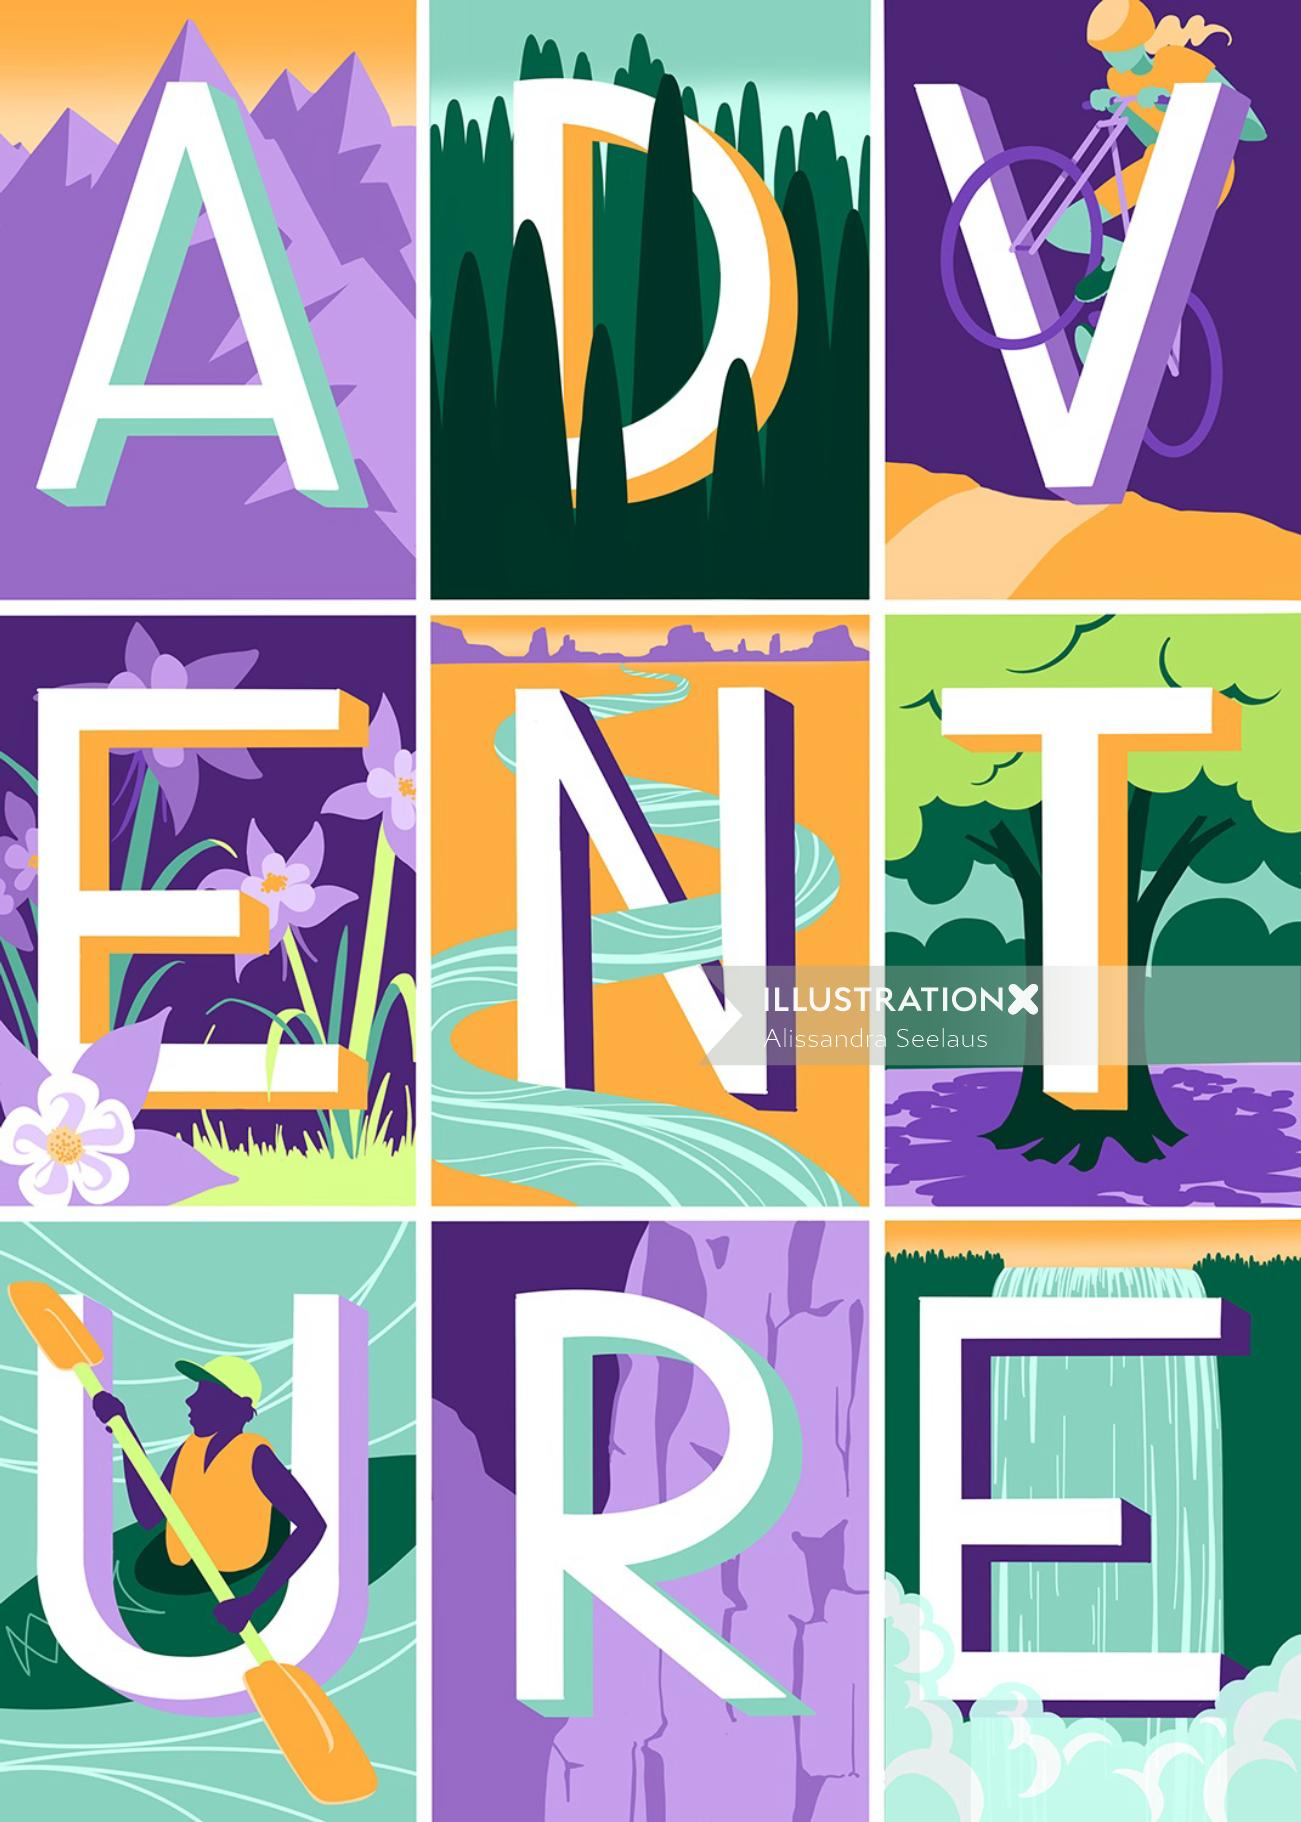 Typography art of adventure